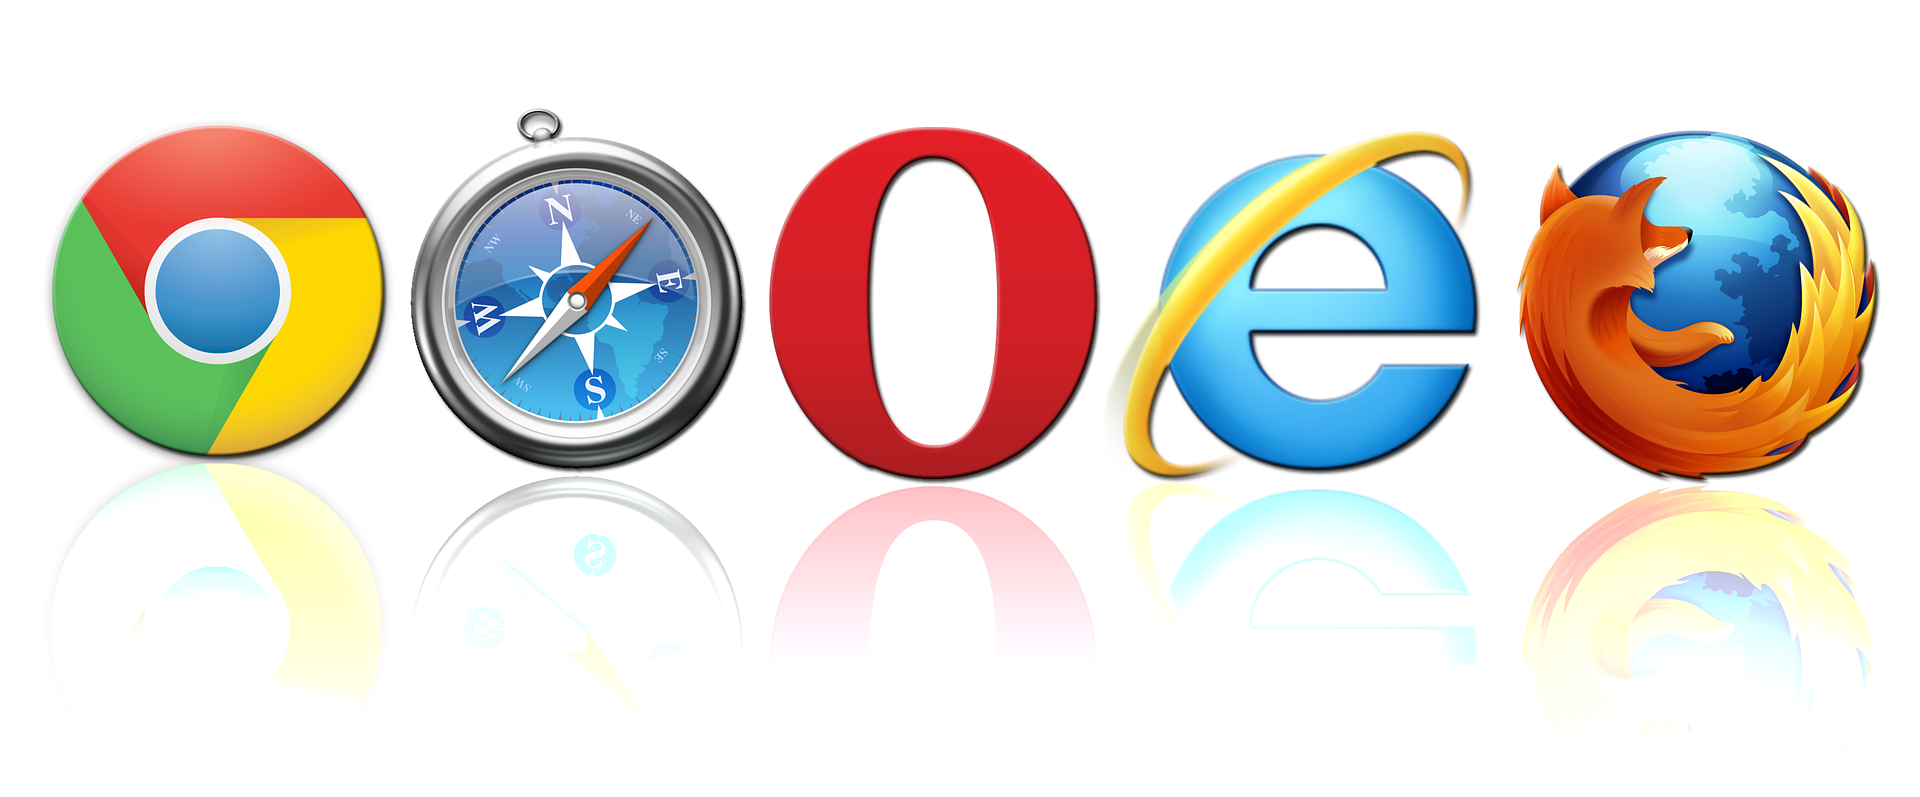 https://petljamediastorage.blob.core.windows.net/root/Media/Default/Kursevi/OnlineNastava/6_razred_IKT_DigitalnaPismenost/browsers1.png